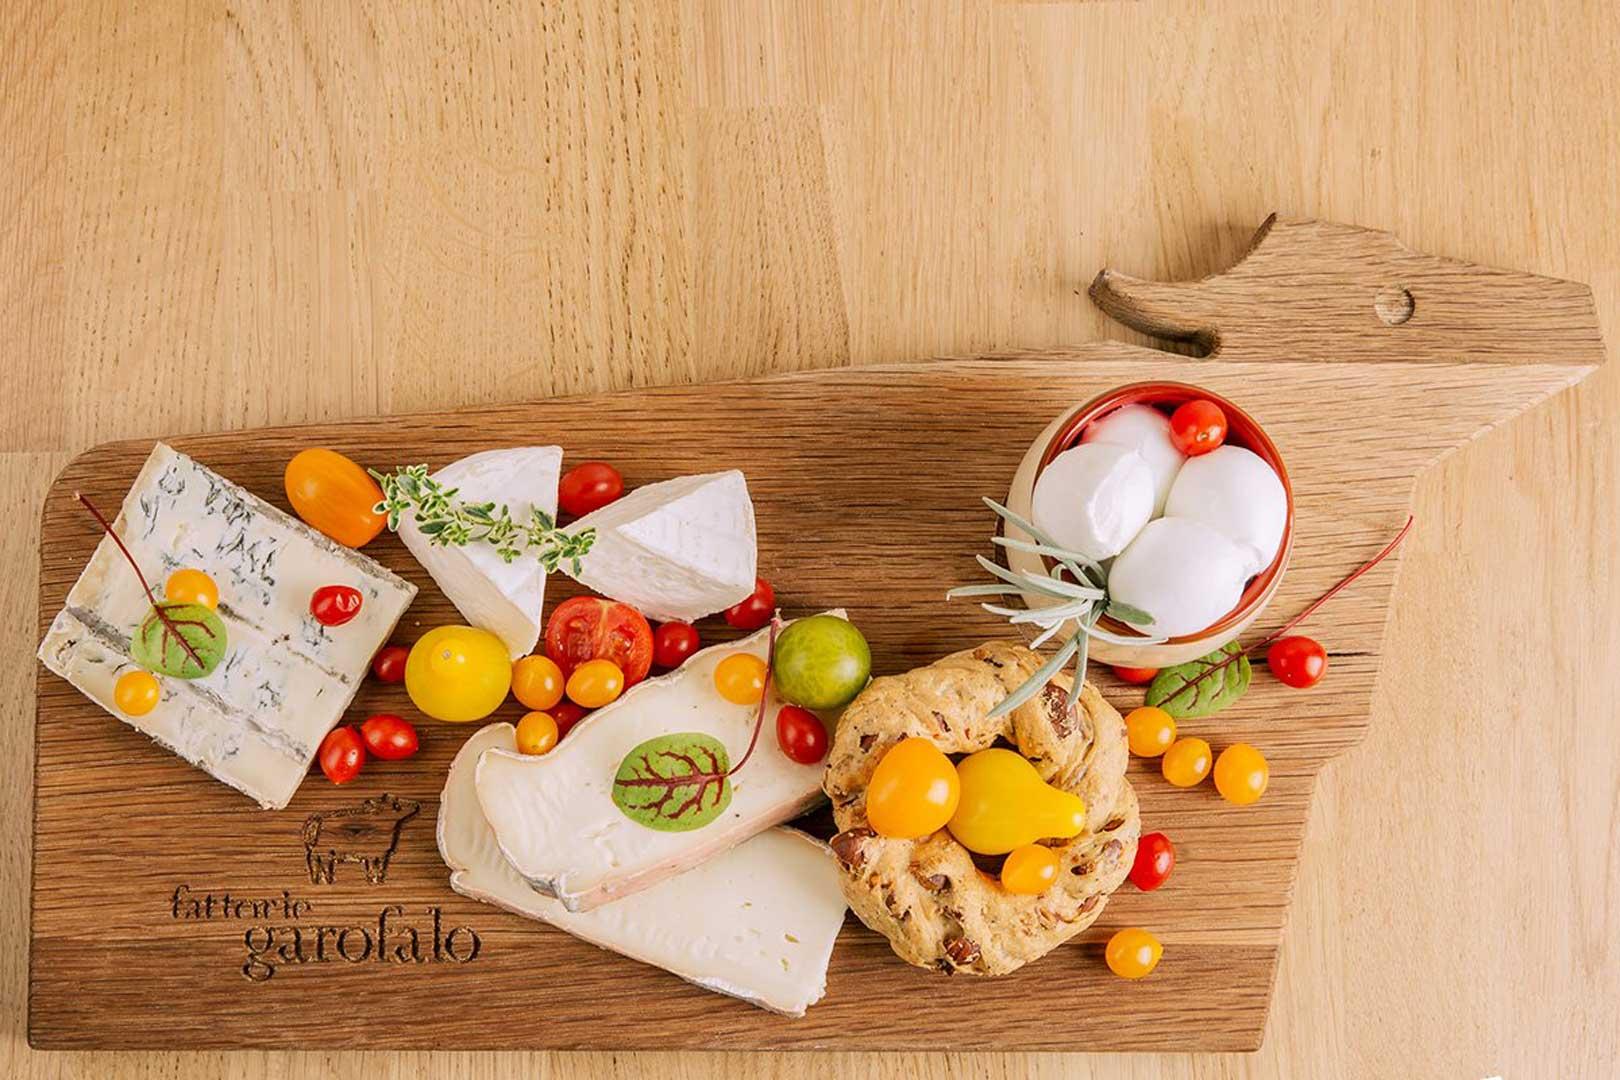 mozzarella-bufala-milano-fattorie-garofalo